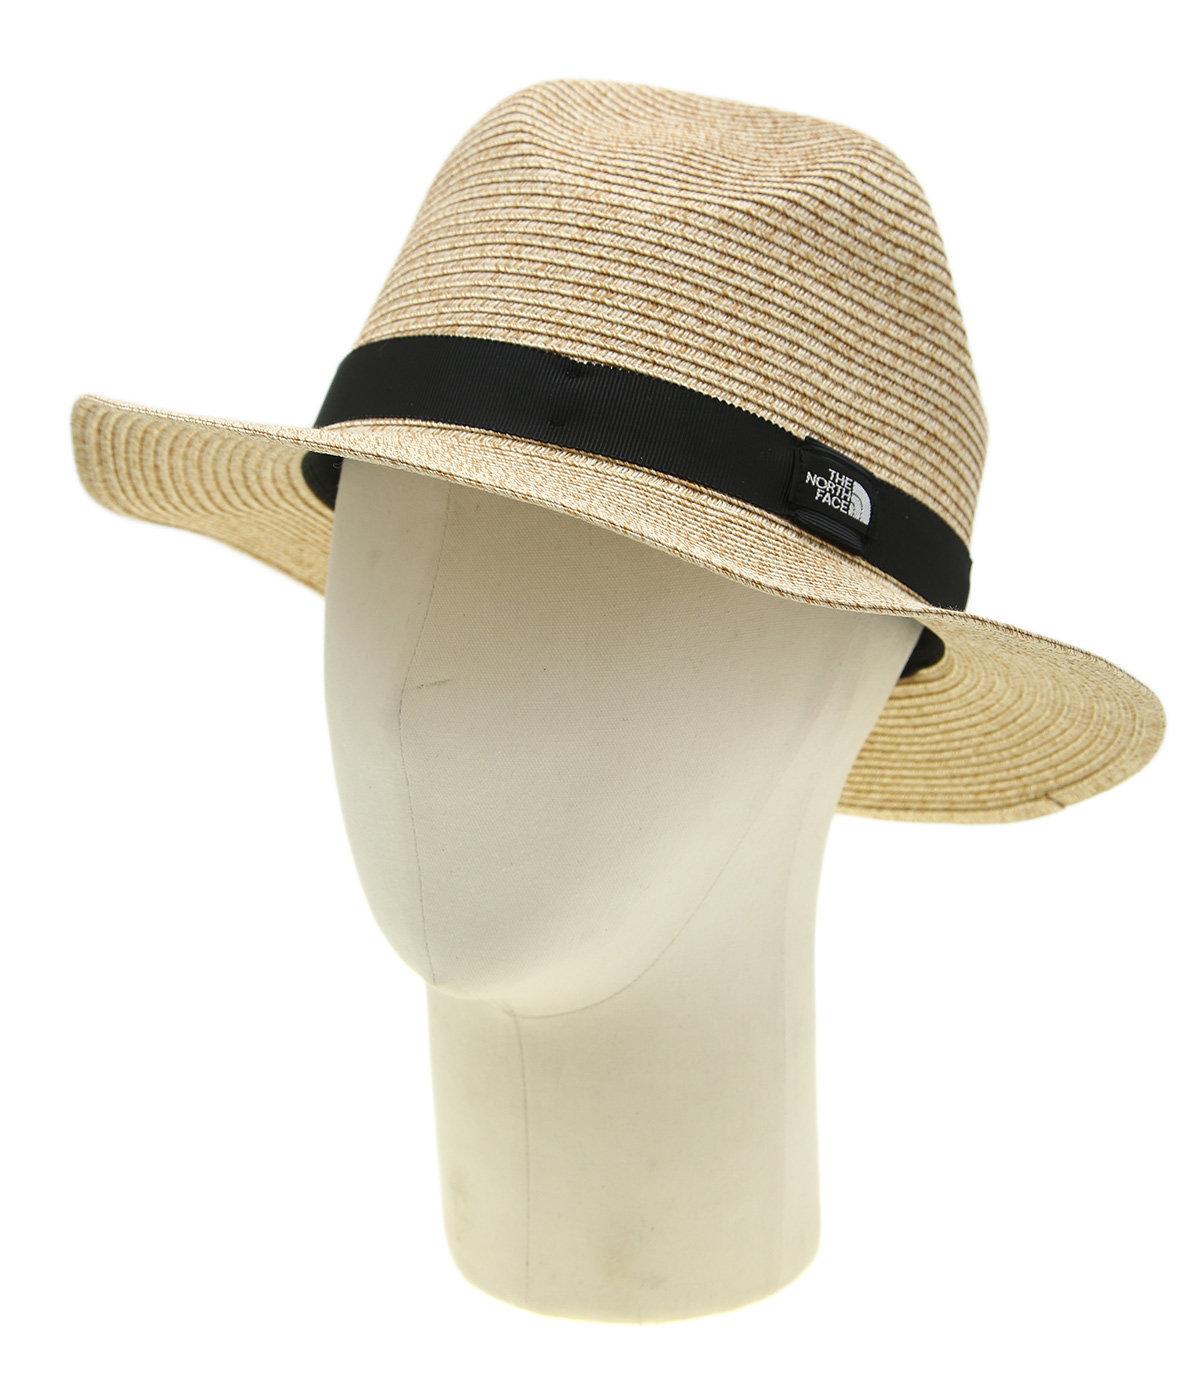 Washable Mountain Braid Hat